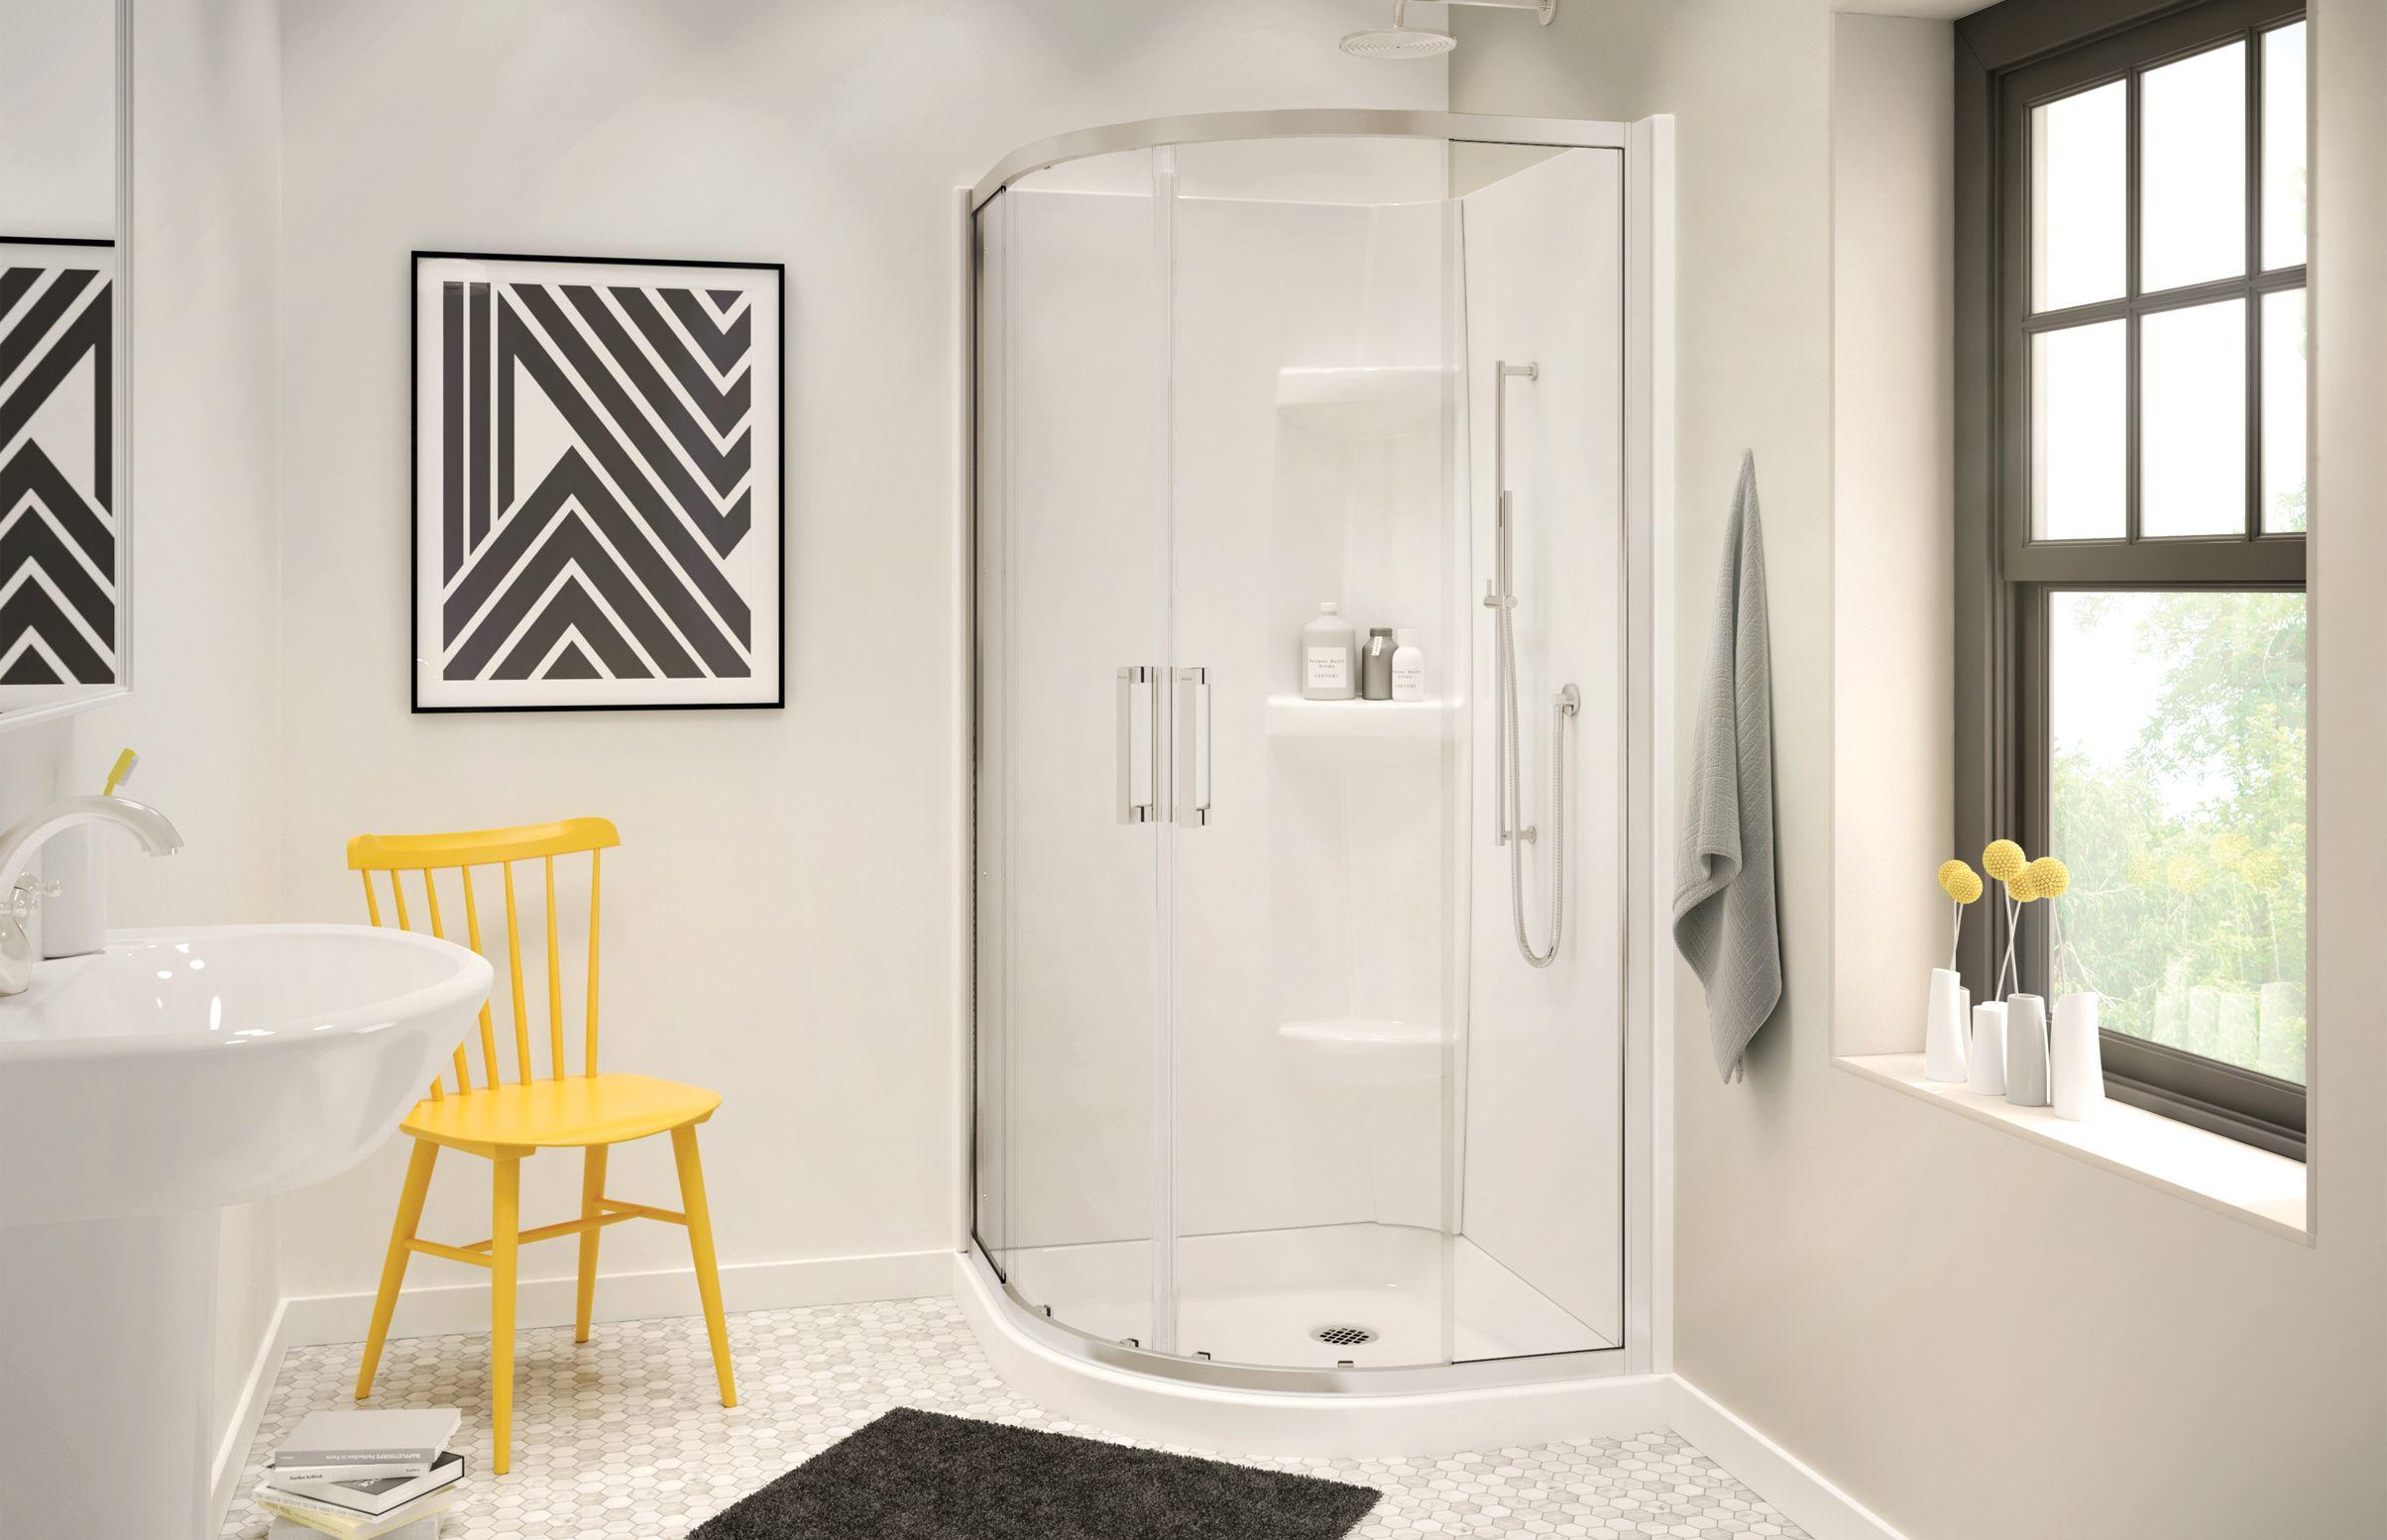 Radia Neo Round Sliding Shower Door 32 X 32 X 71 In 6 Mm